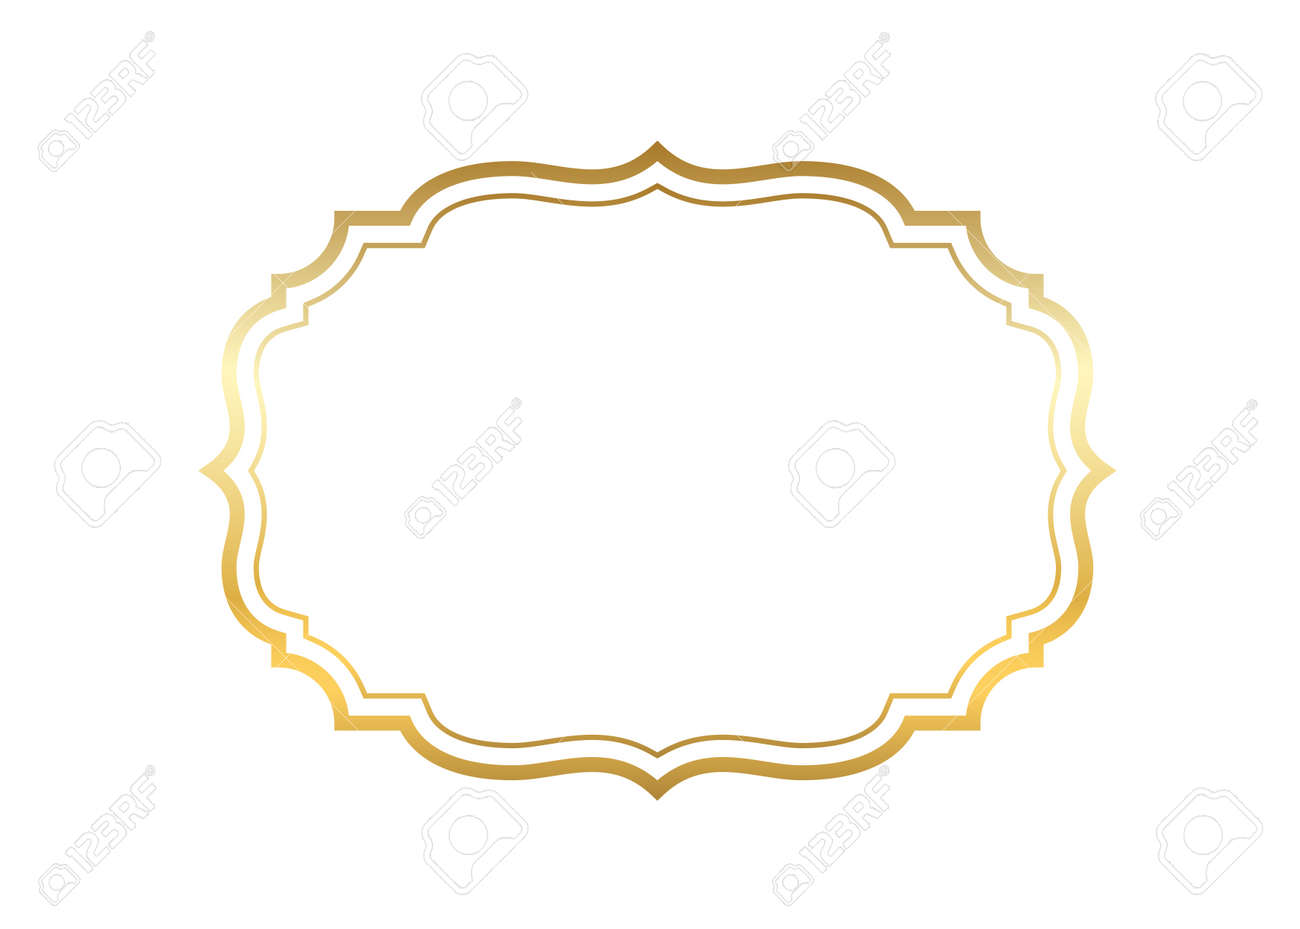 Gold Frame Beautiful Simple Golden Design Vintage Style Decorative Border Isolated White Background